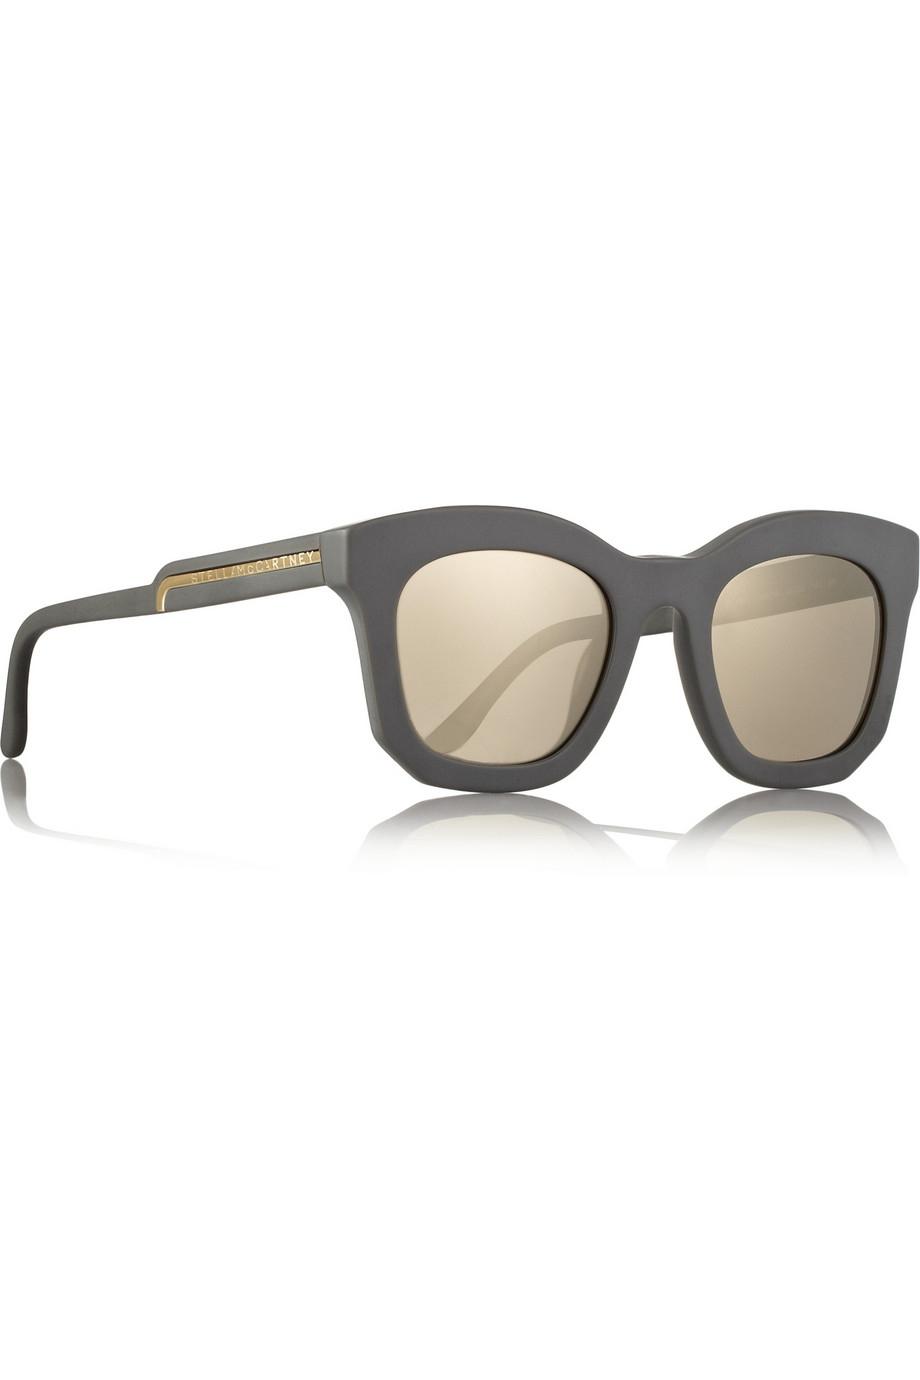 9f6537ef7dca Lyst - Stella McCartney D-Frame Acetate Mirrored Sunglasses in Gray